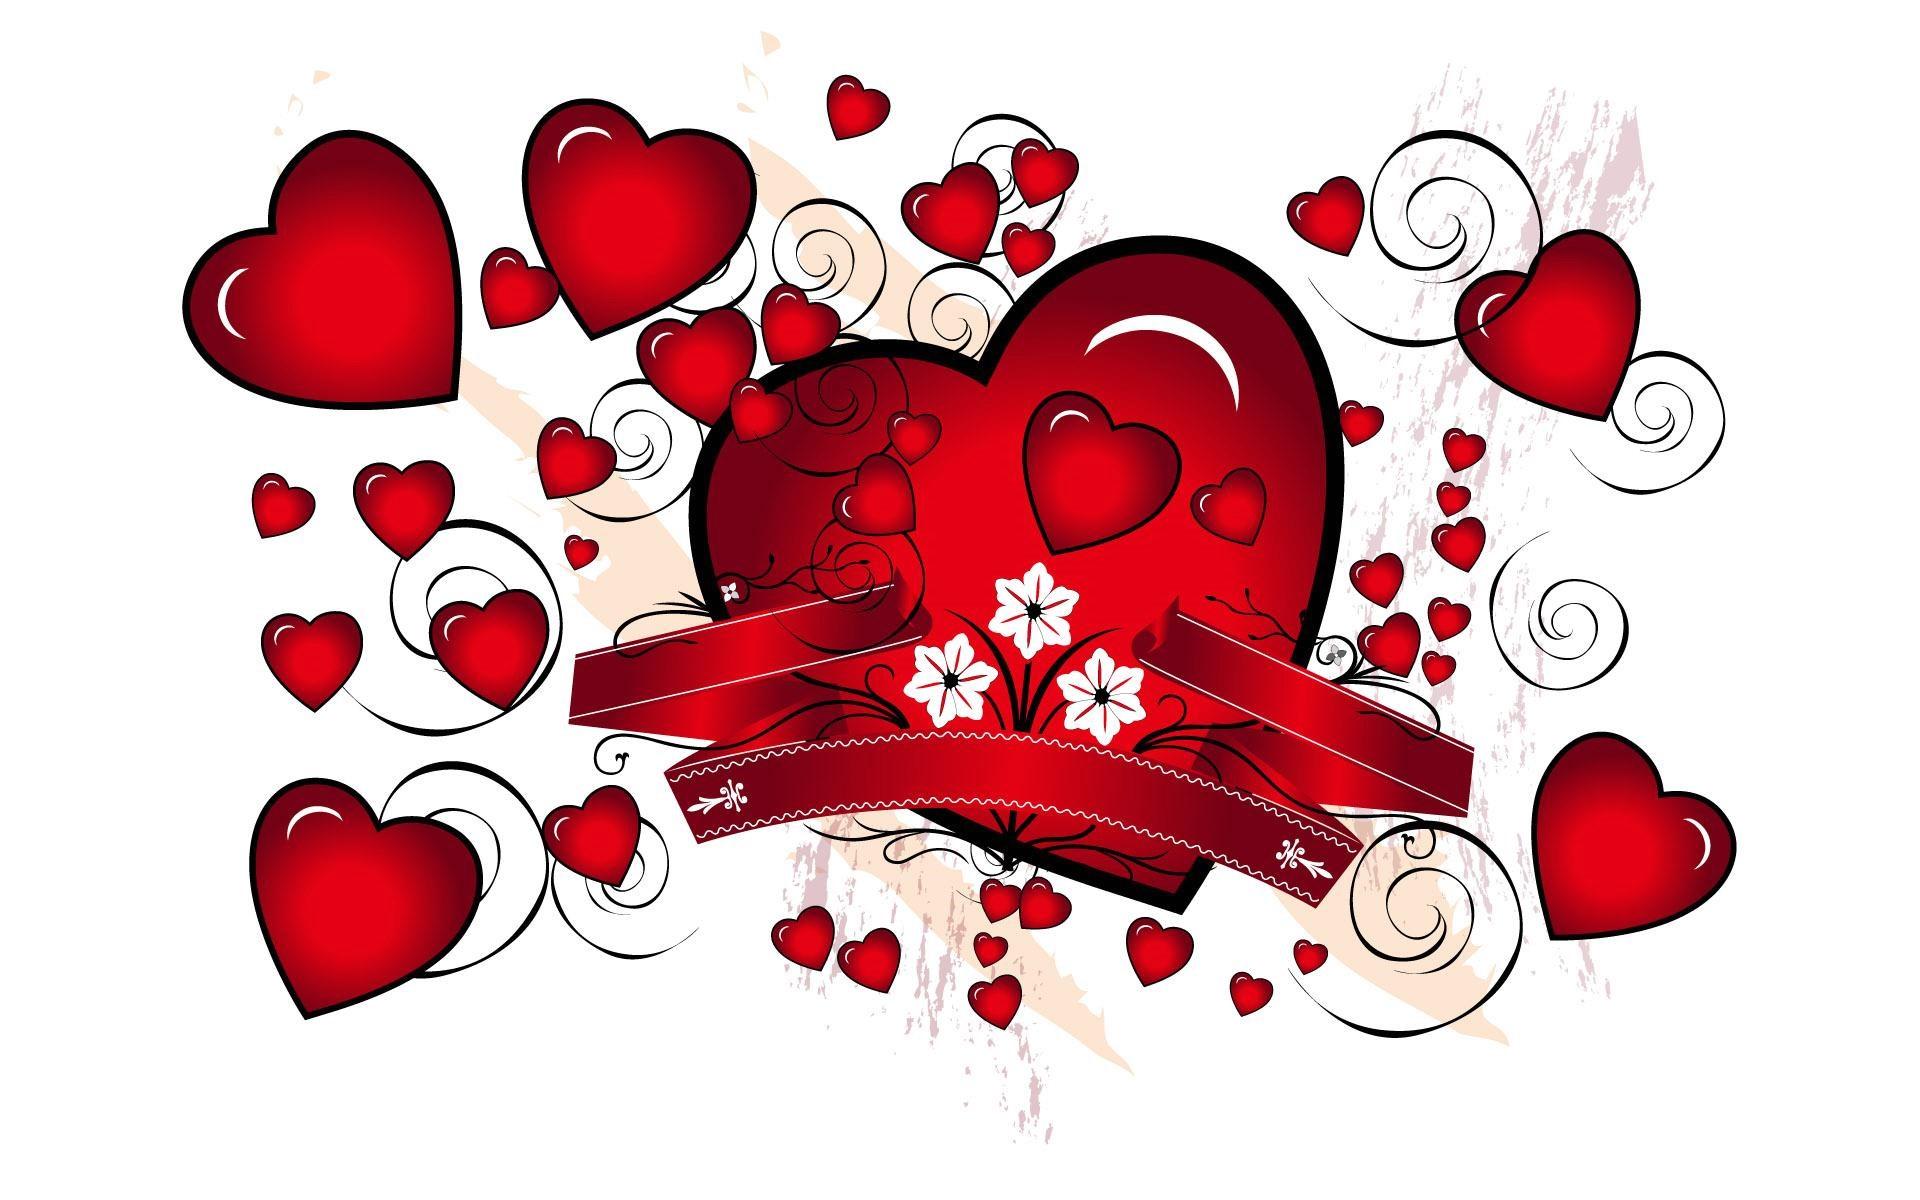 рисунки любовь картинки сердечки